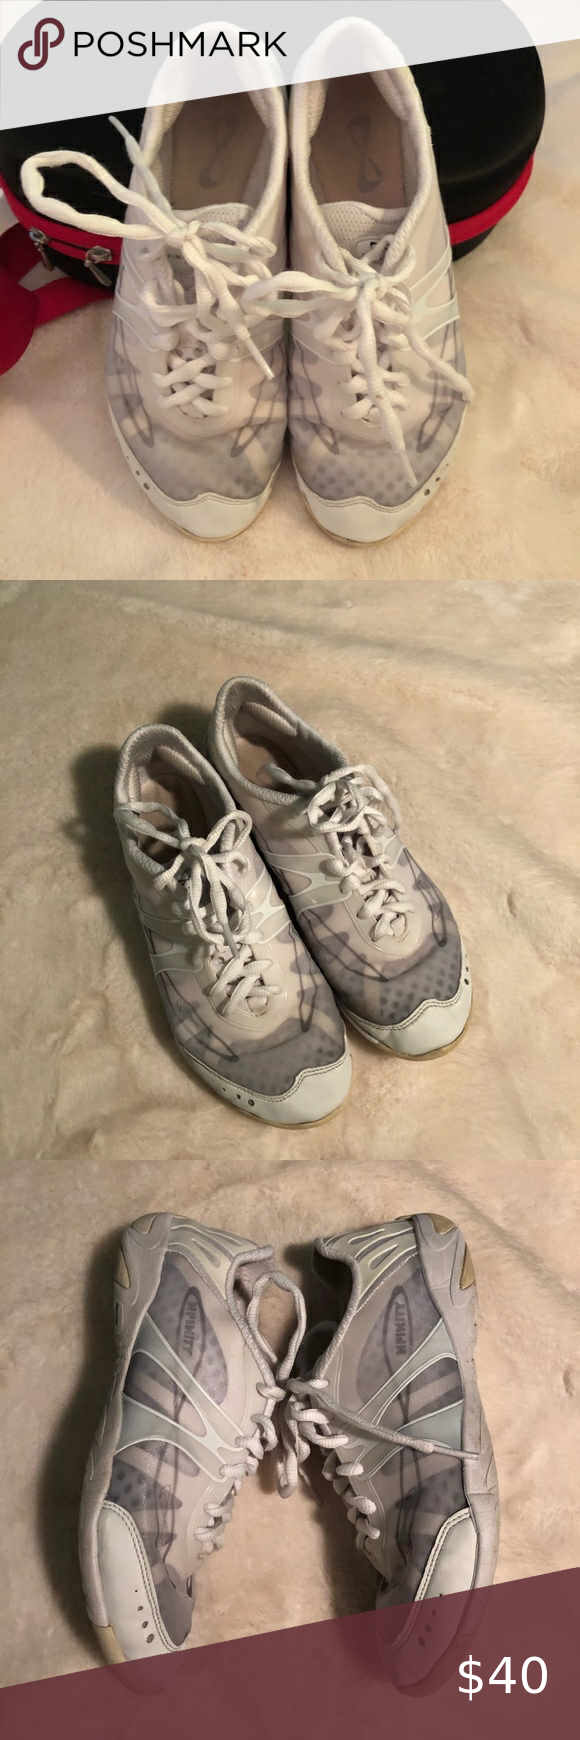 Nfinity Vengeance Cheer Shoe Size 8 Case In 2020 Cheer Shoes Nfinity Shoes Nfinity